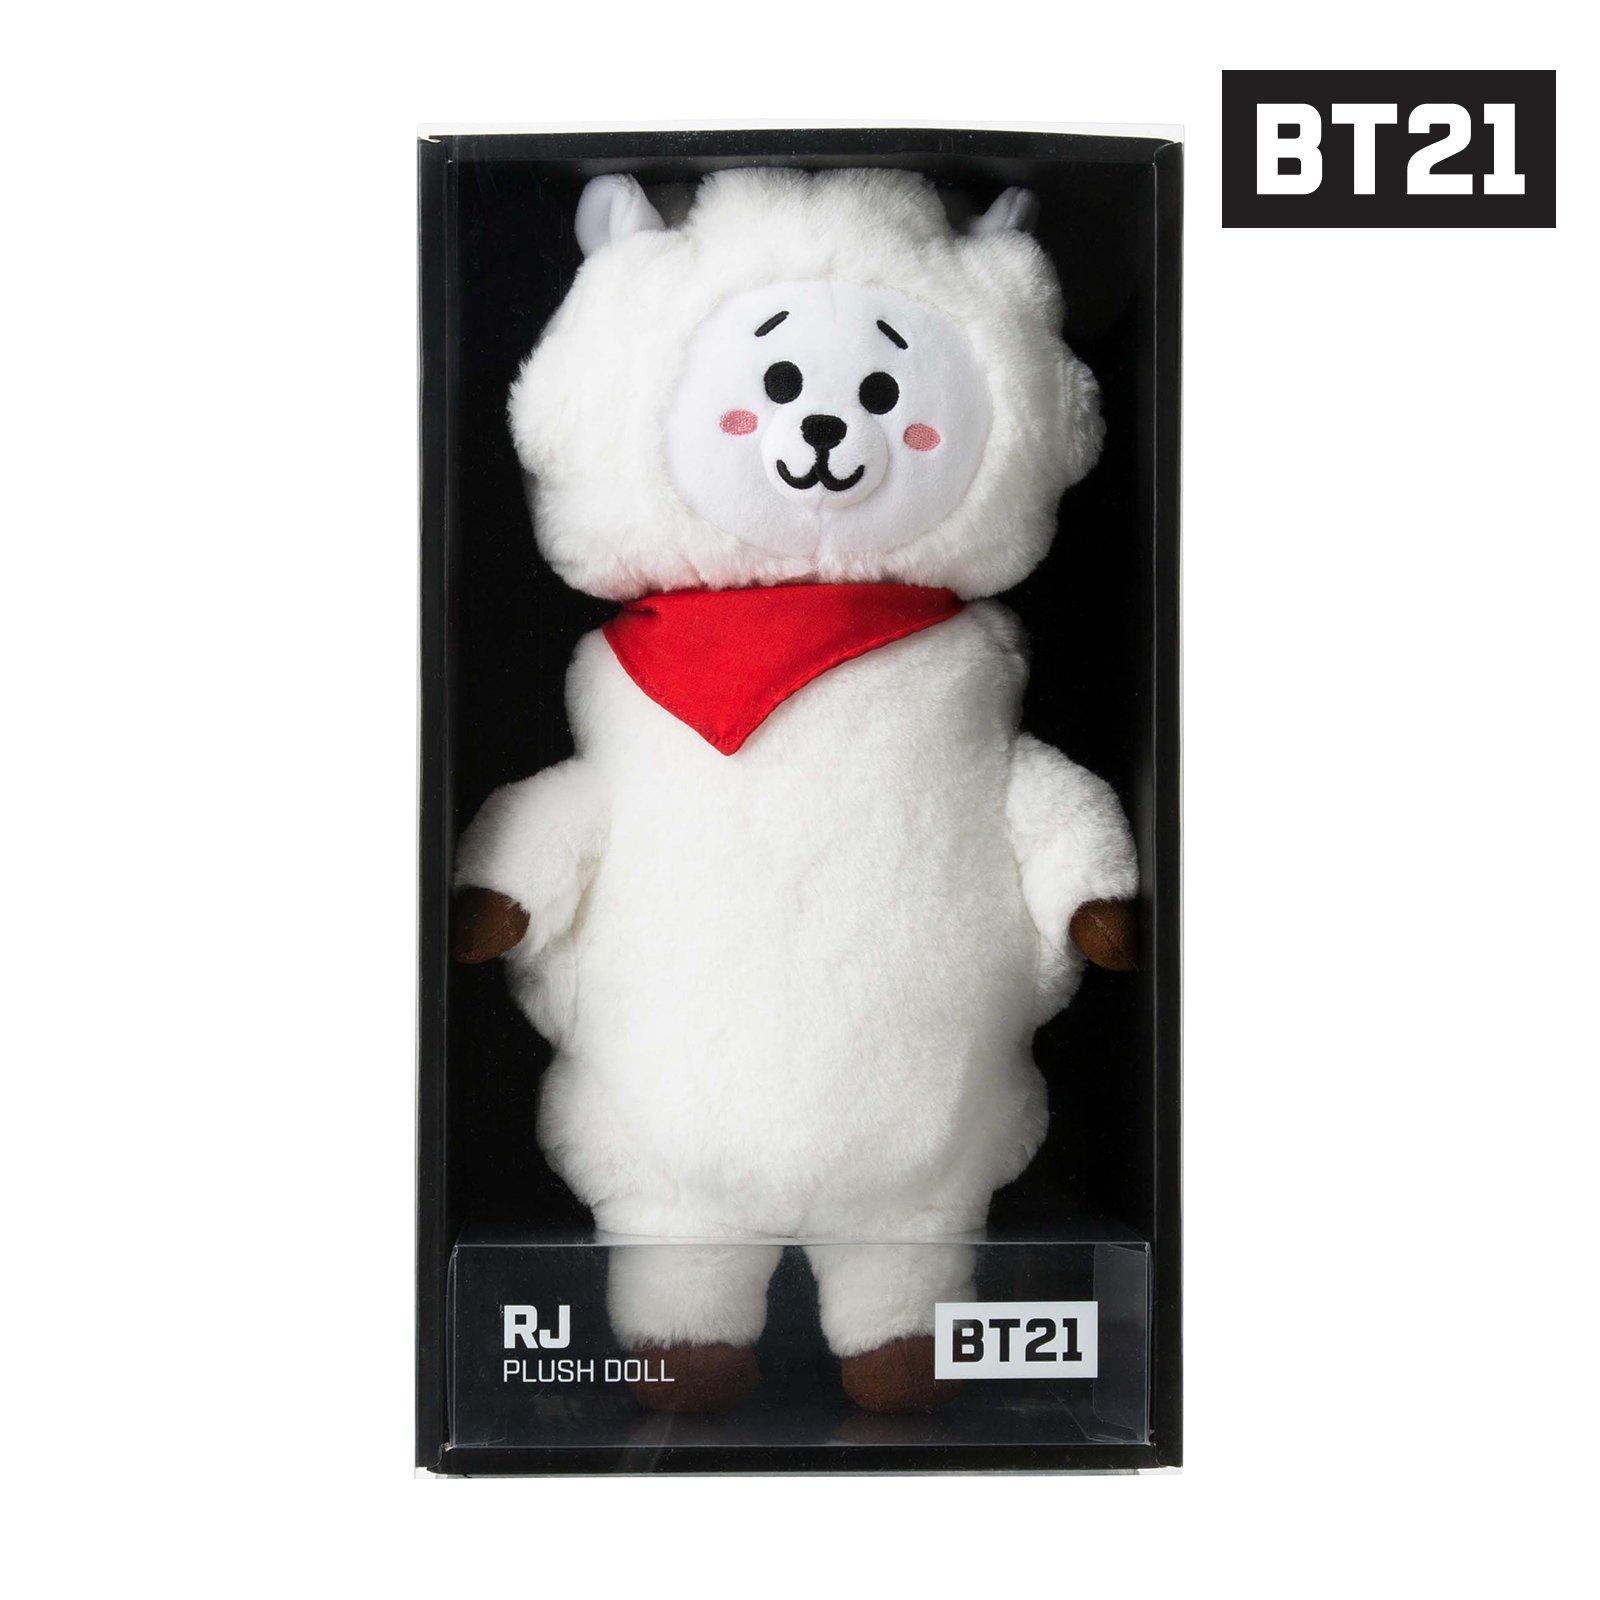 BT21 RJ Standing Plush Doll Medium White by BT21 (Image #8)